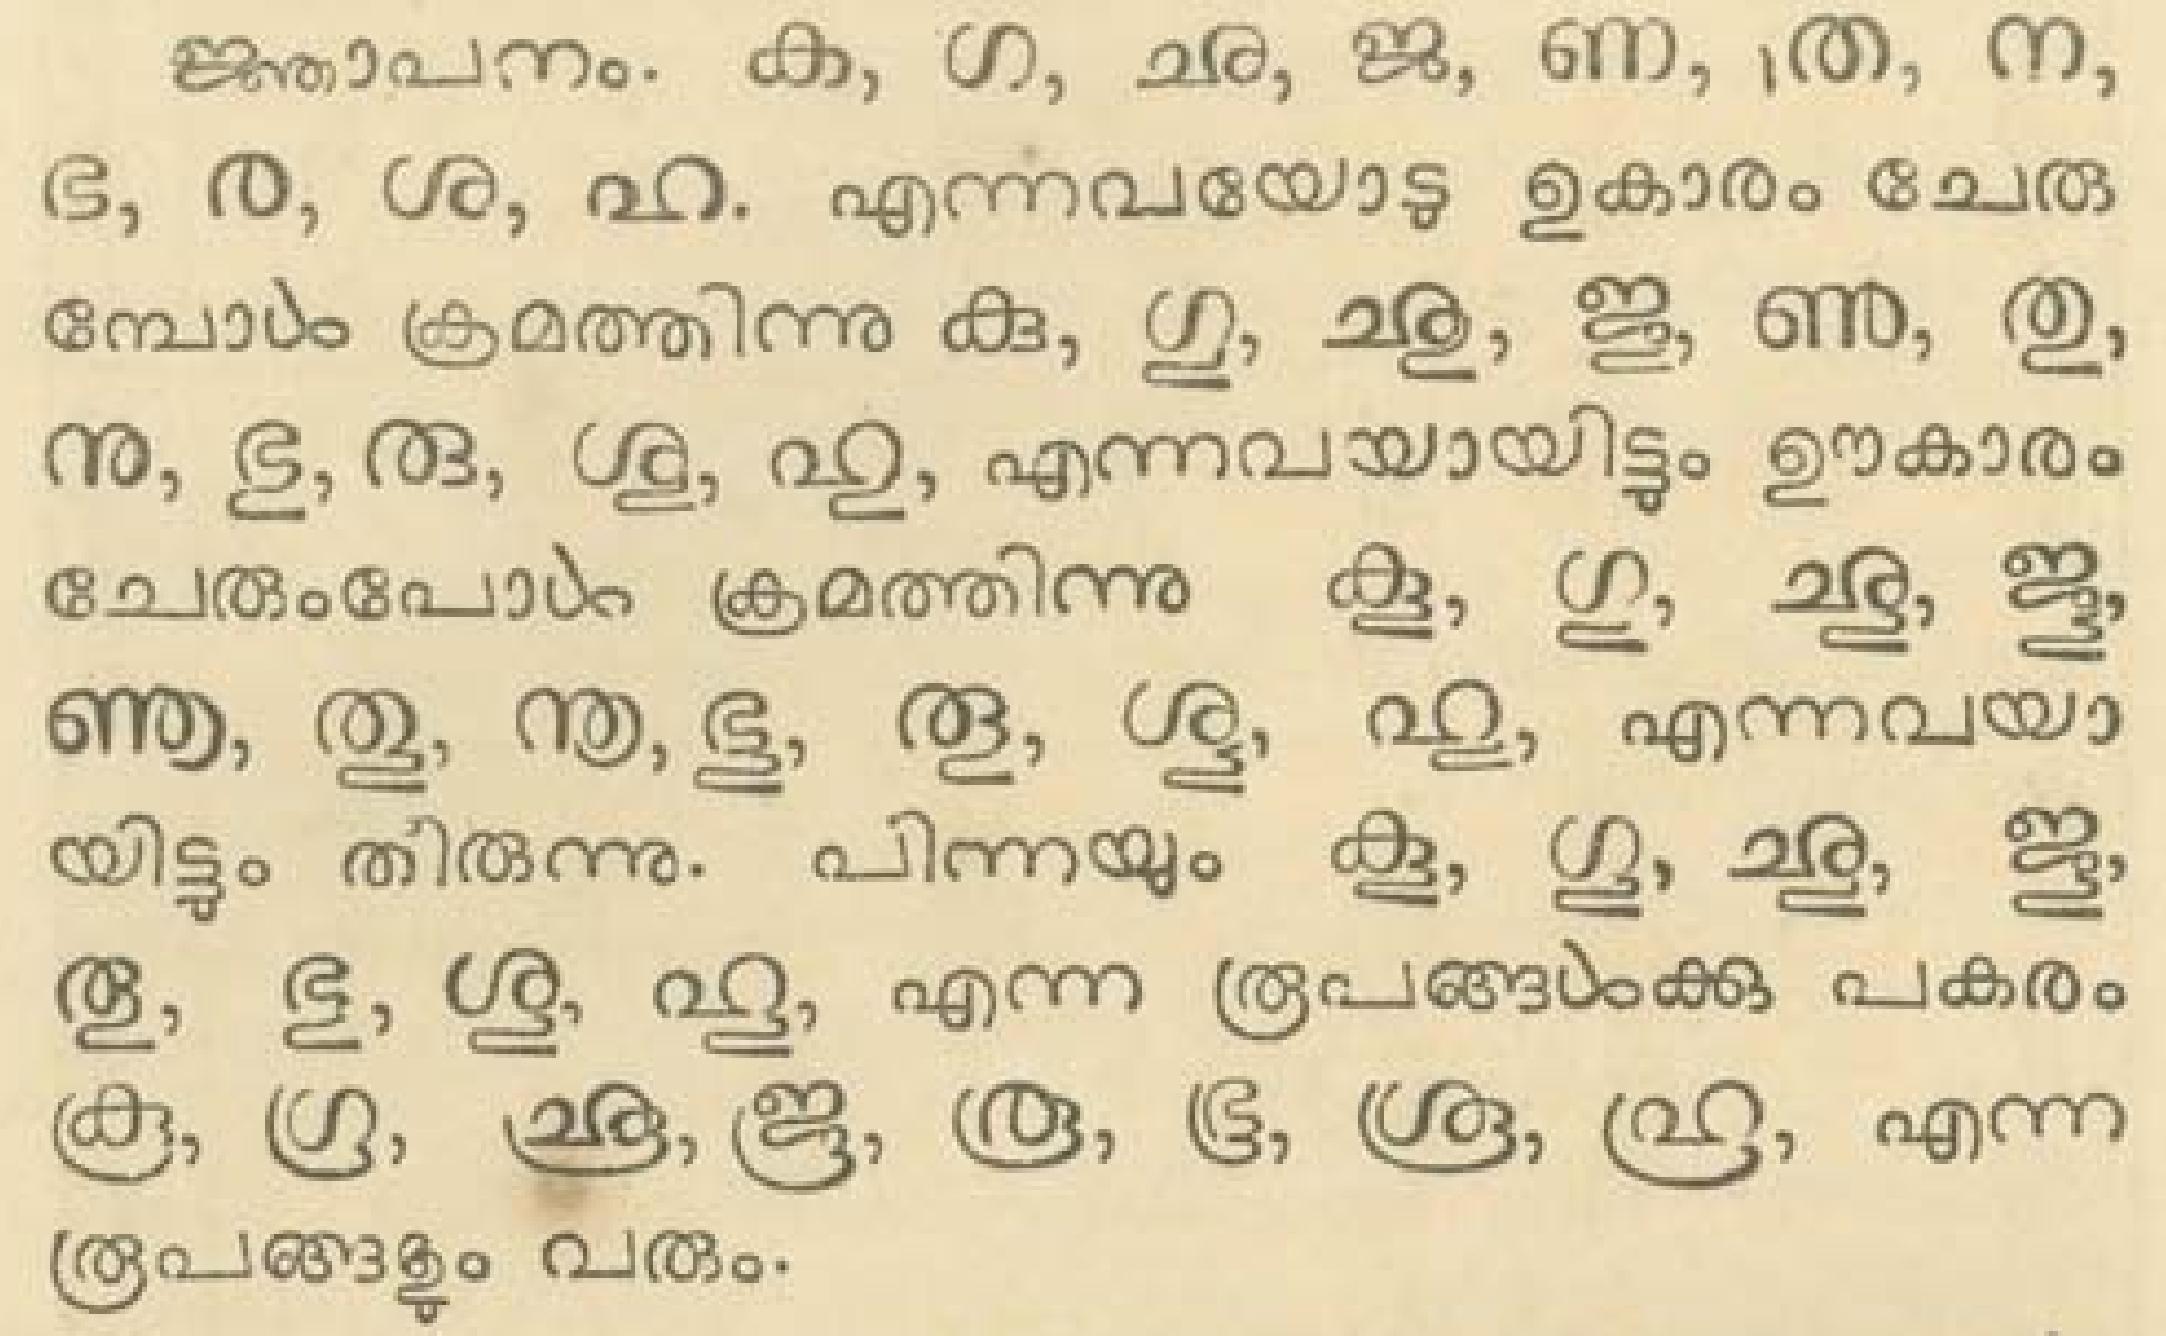 Grammar of Malayalam- George Mathan